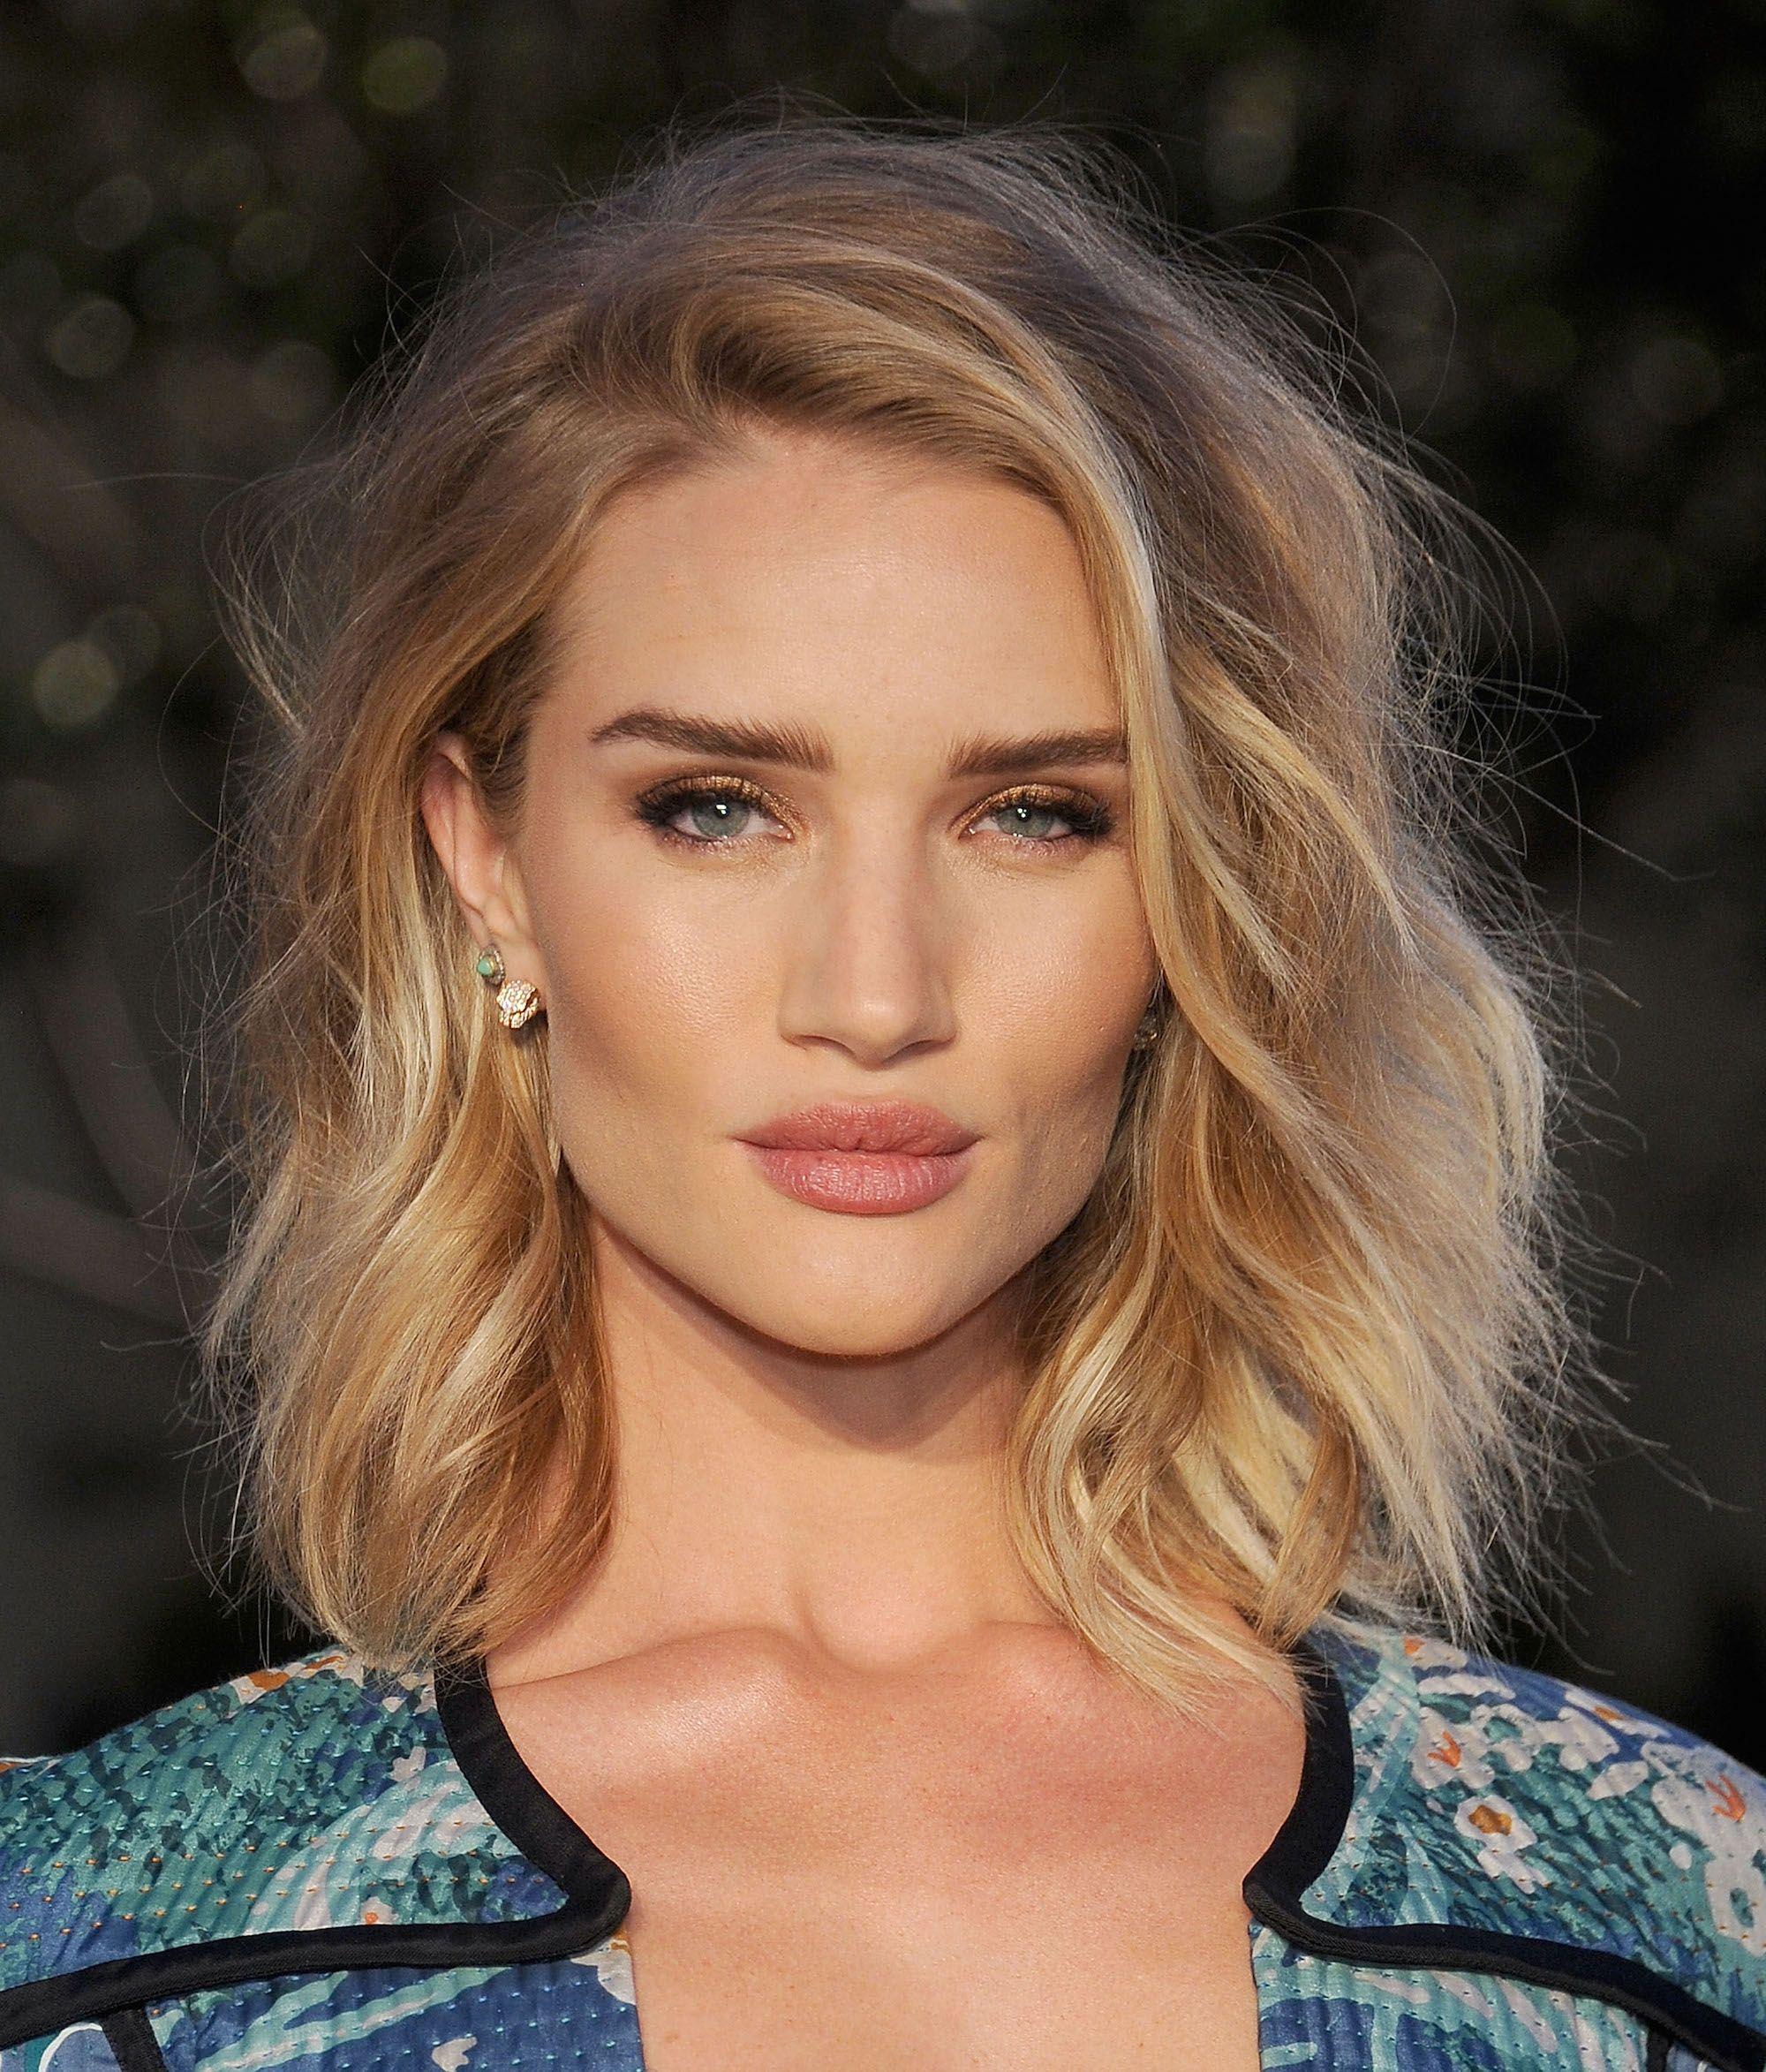 Shoulder Length Hair Medium Length Lob Hairstyle Inspiration